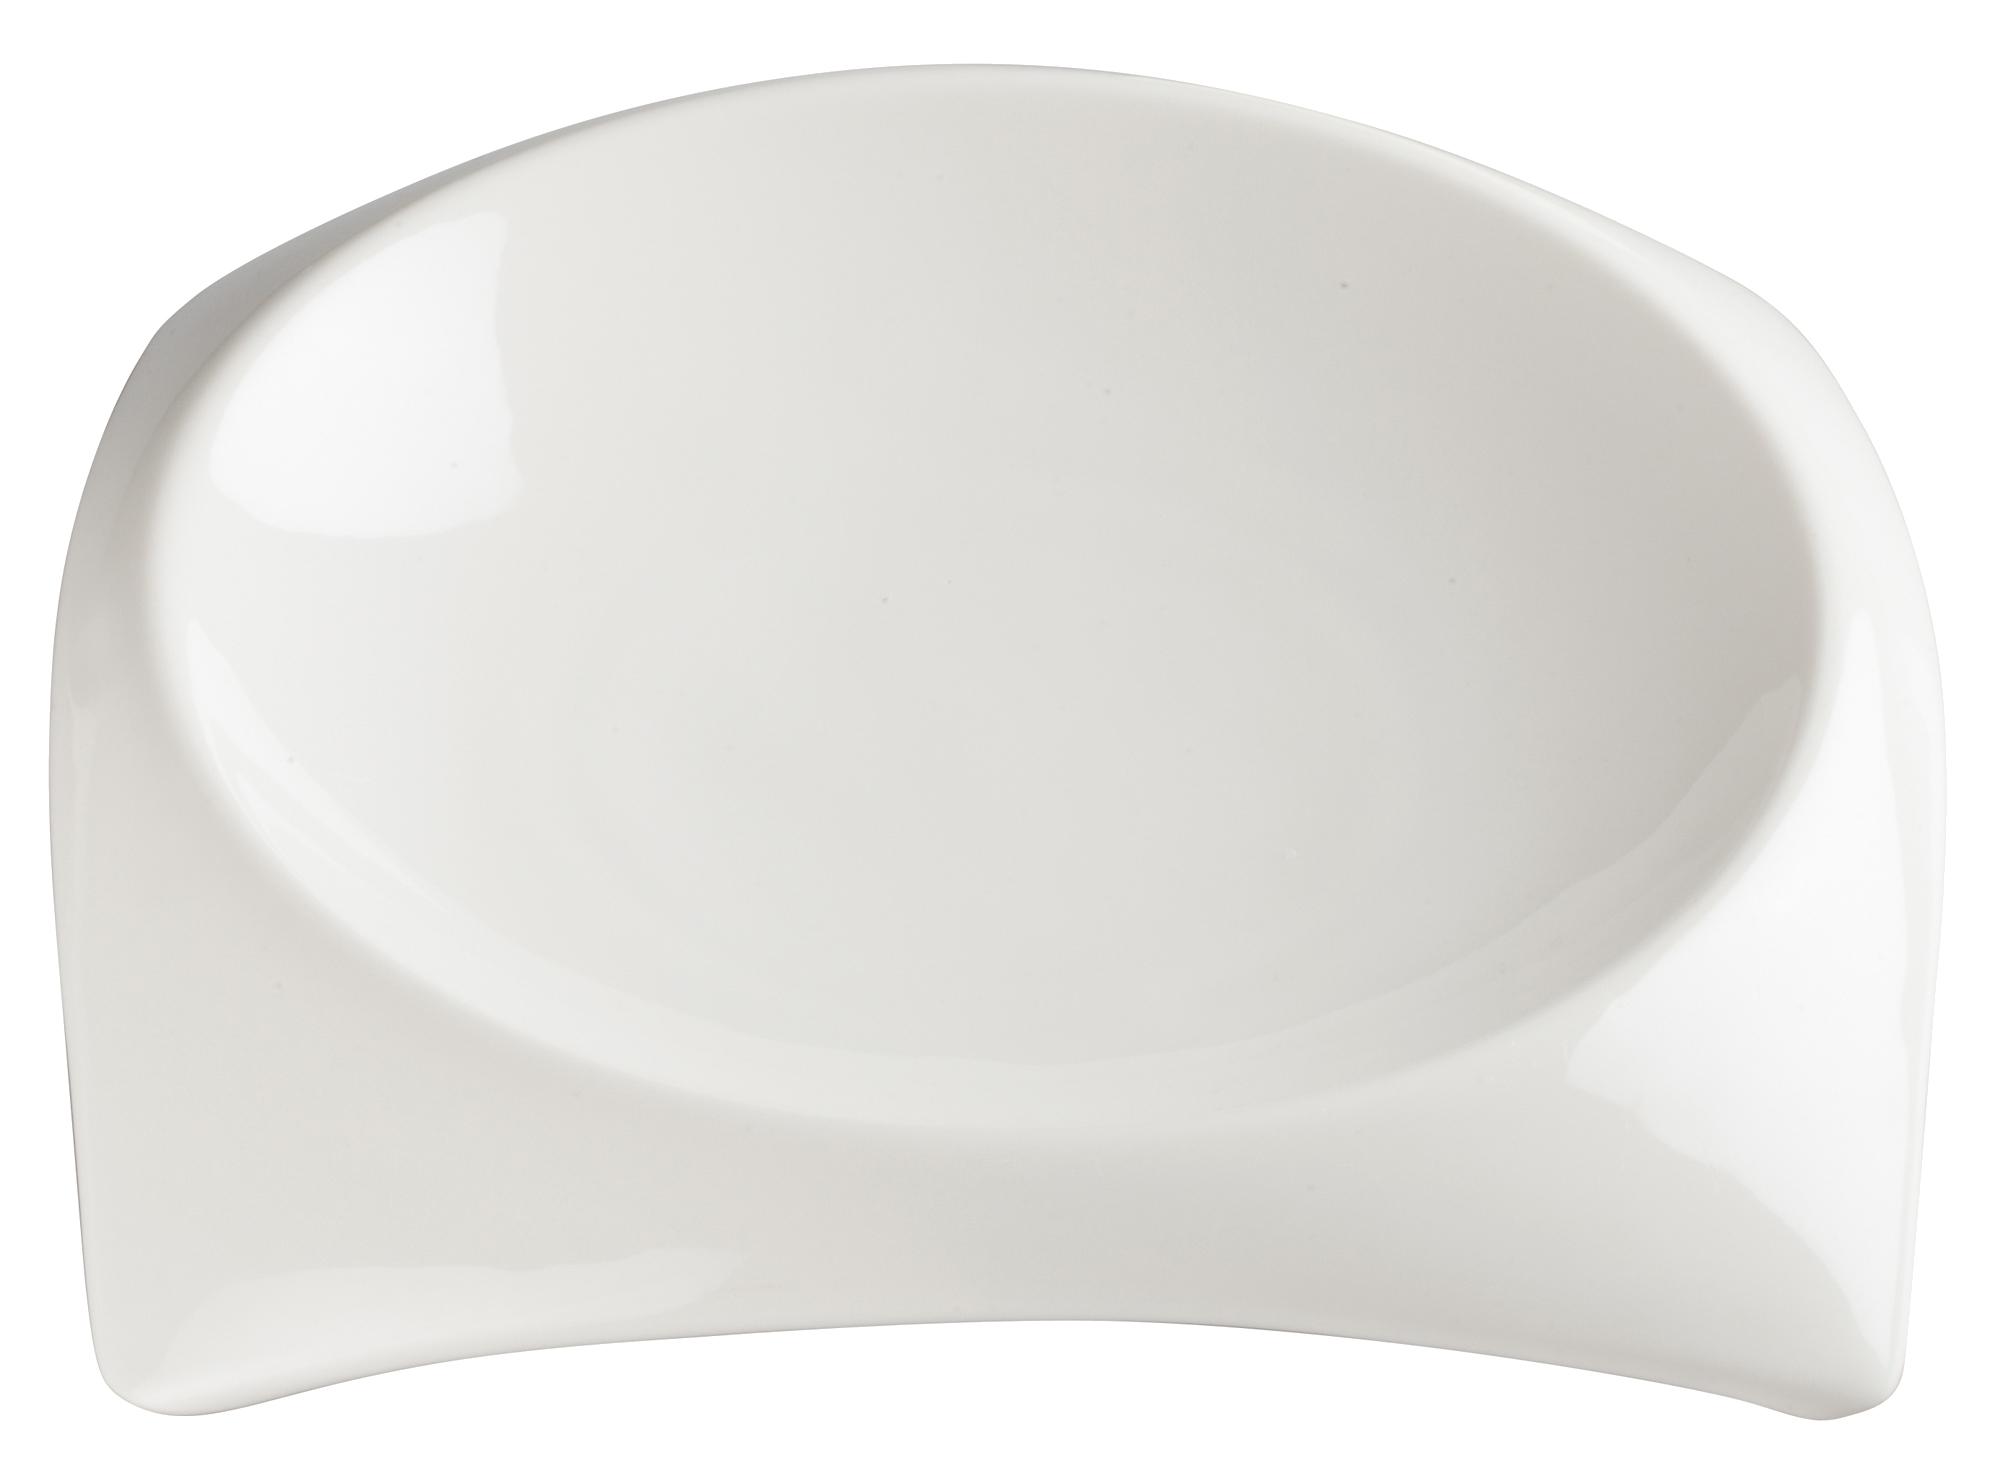 Winco WDP005-102 china, bowl,  9 - 16 oz